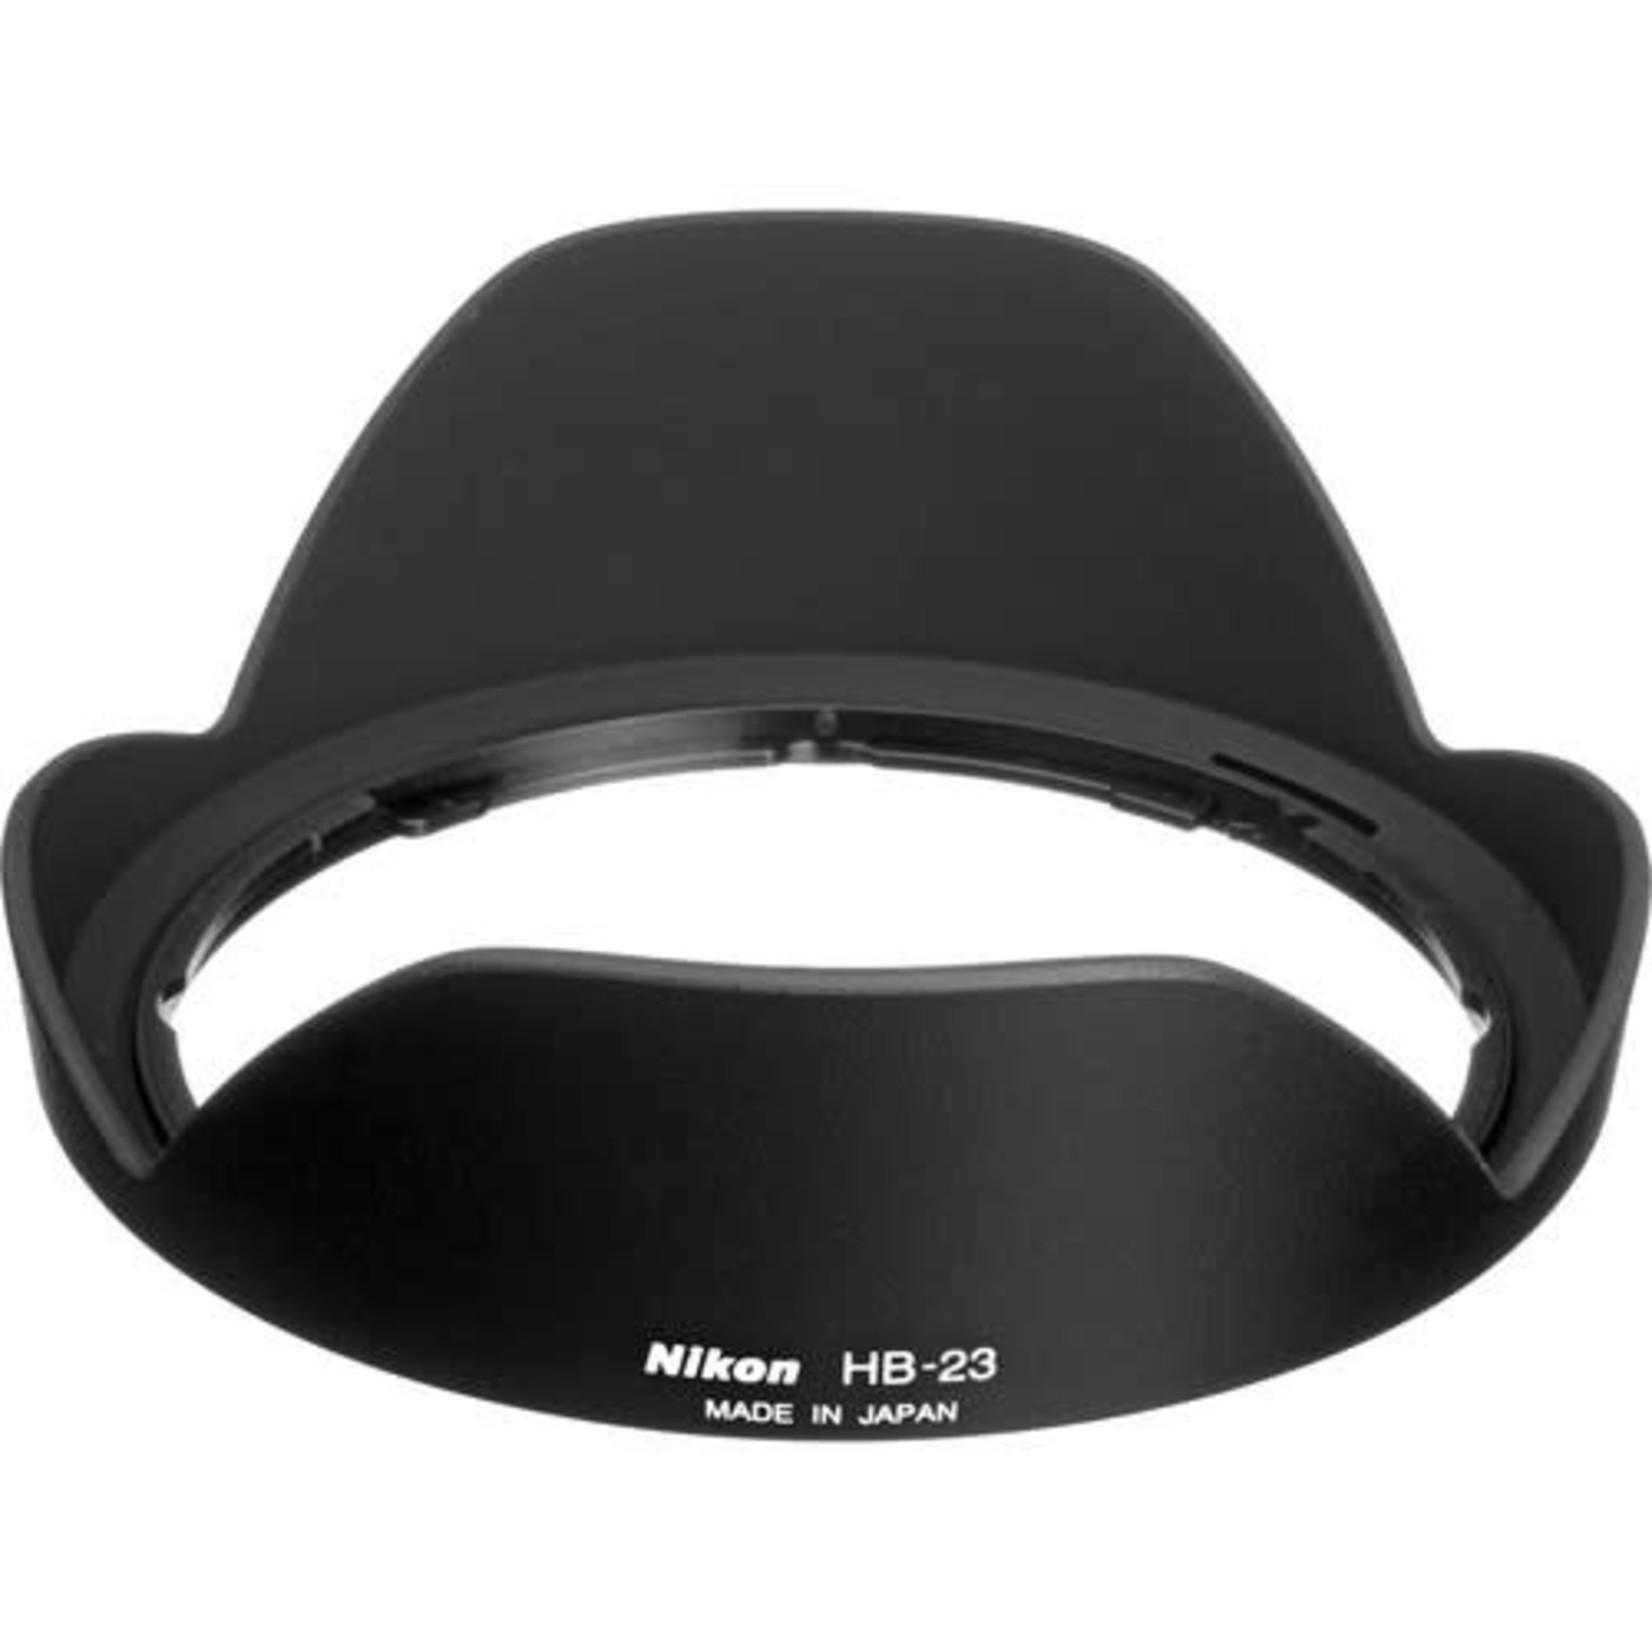 Nikon Nikon HB-23 Bayonet Lens Hood